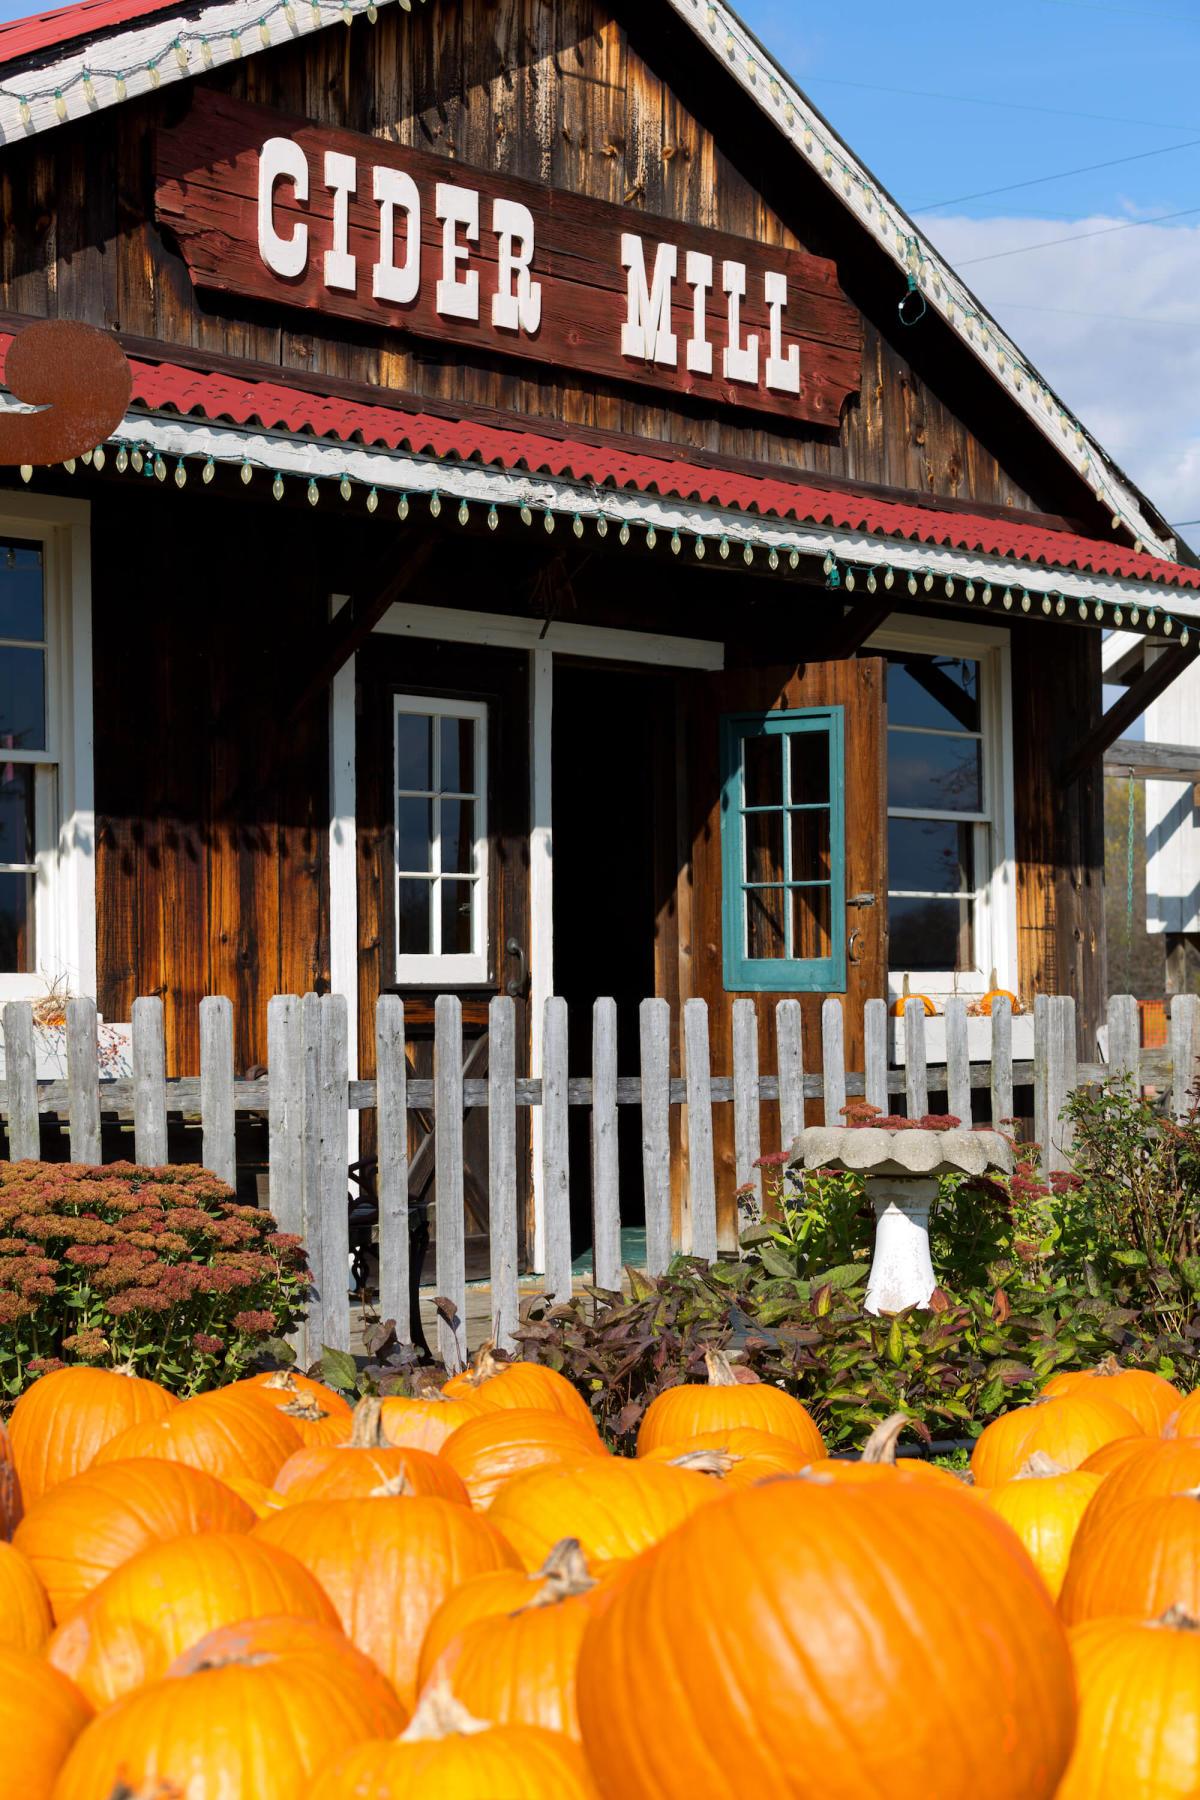 Bayne's Apple Valley Farm